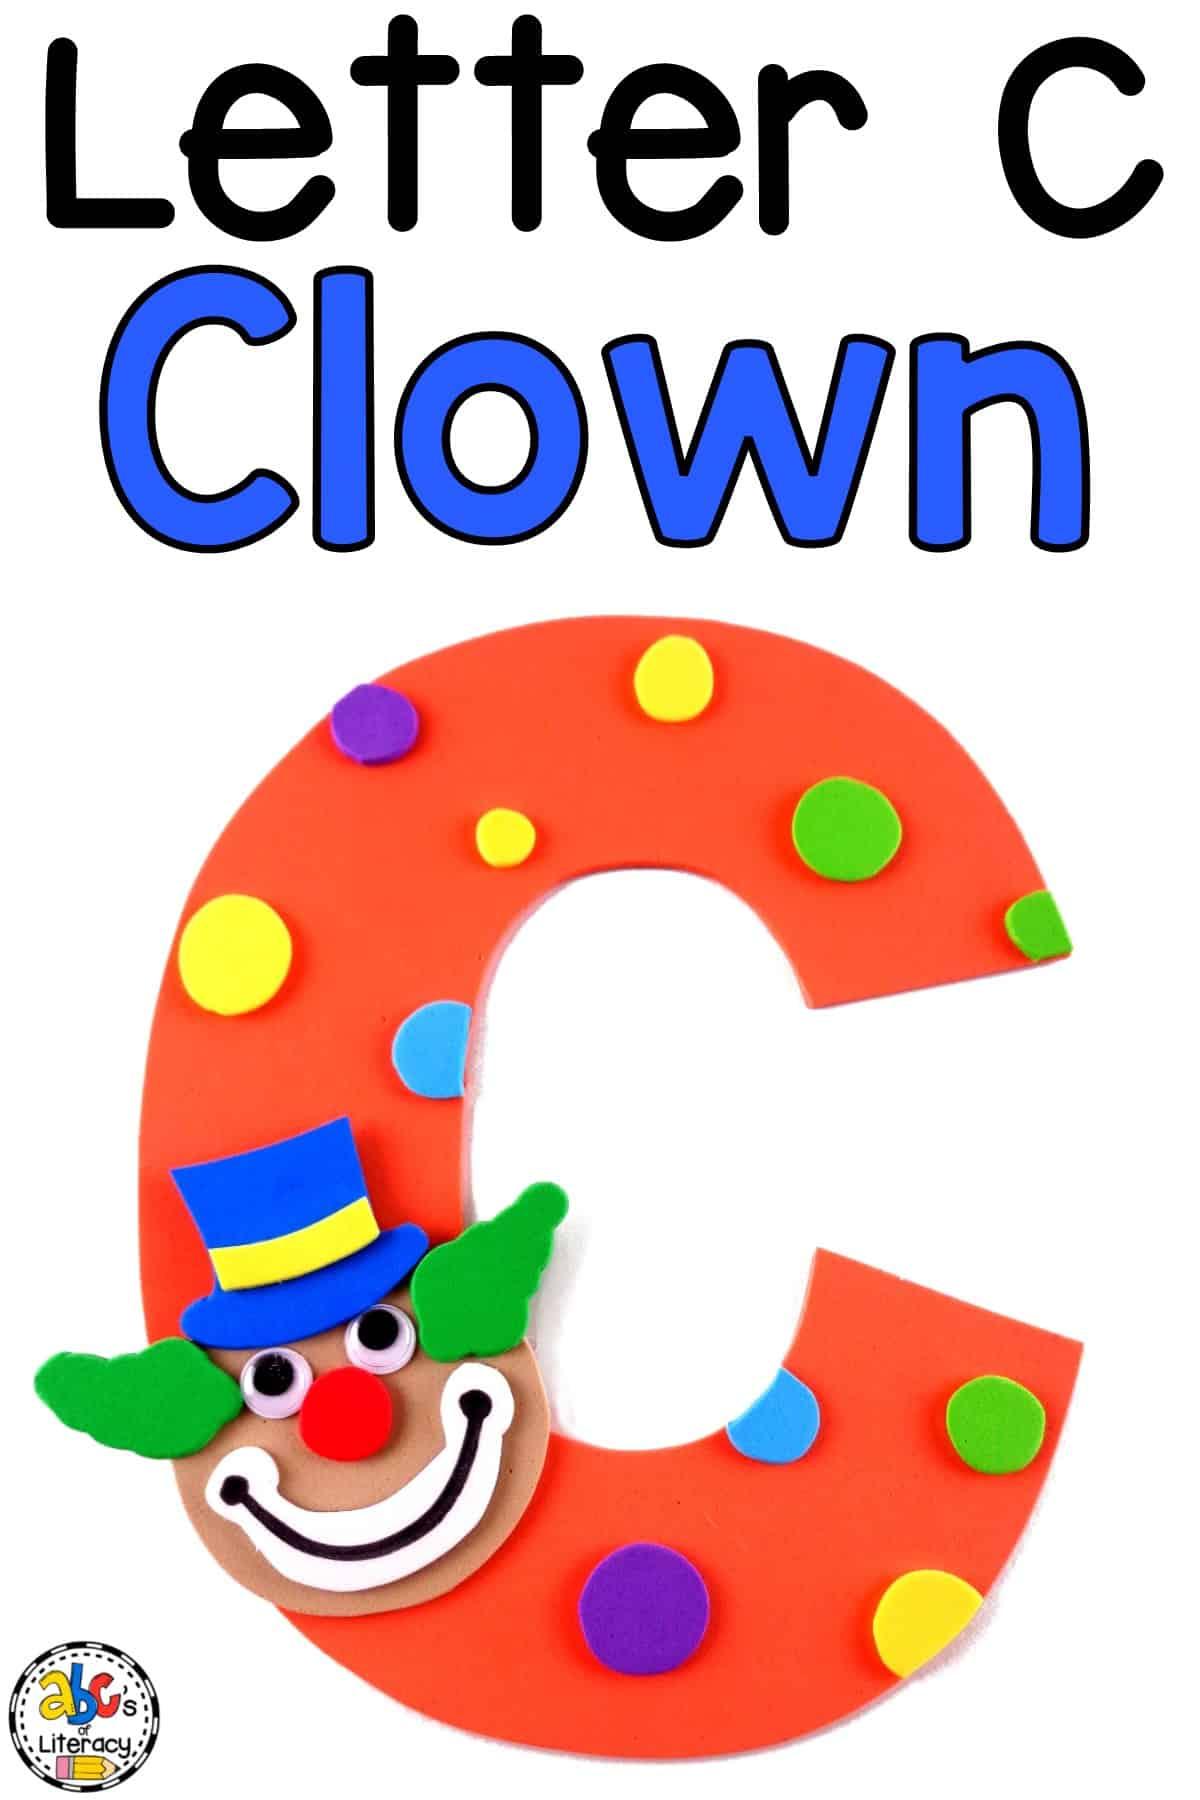 Letter C Clown Craft, Clown Craft, Letter C Craft, Letter of the Week, Letter of the Week Craft